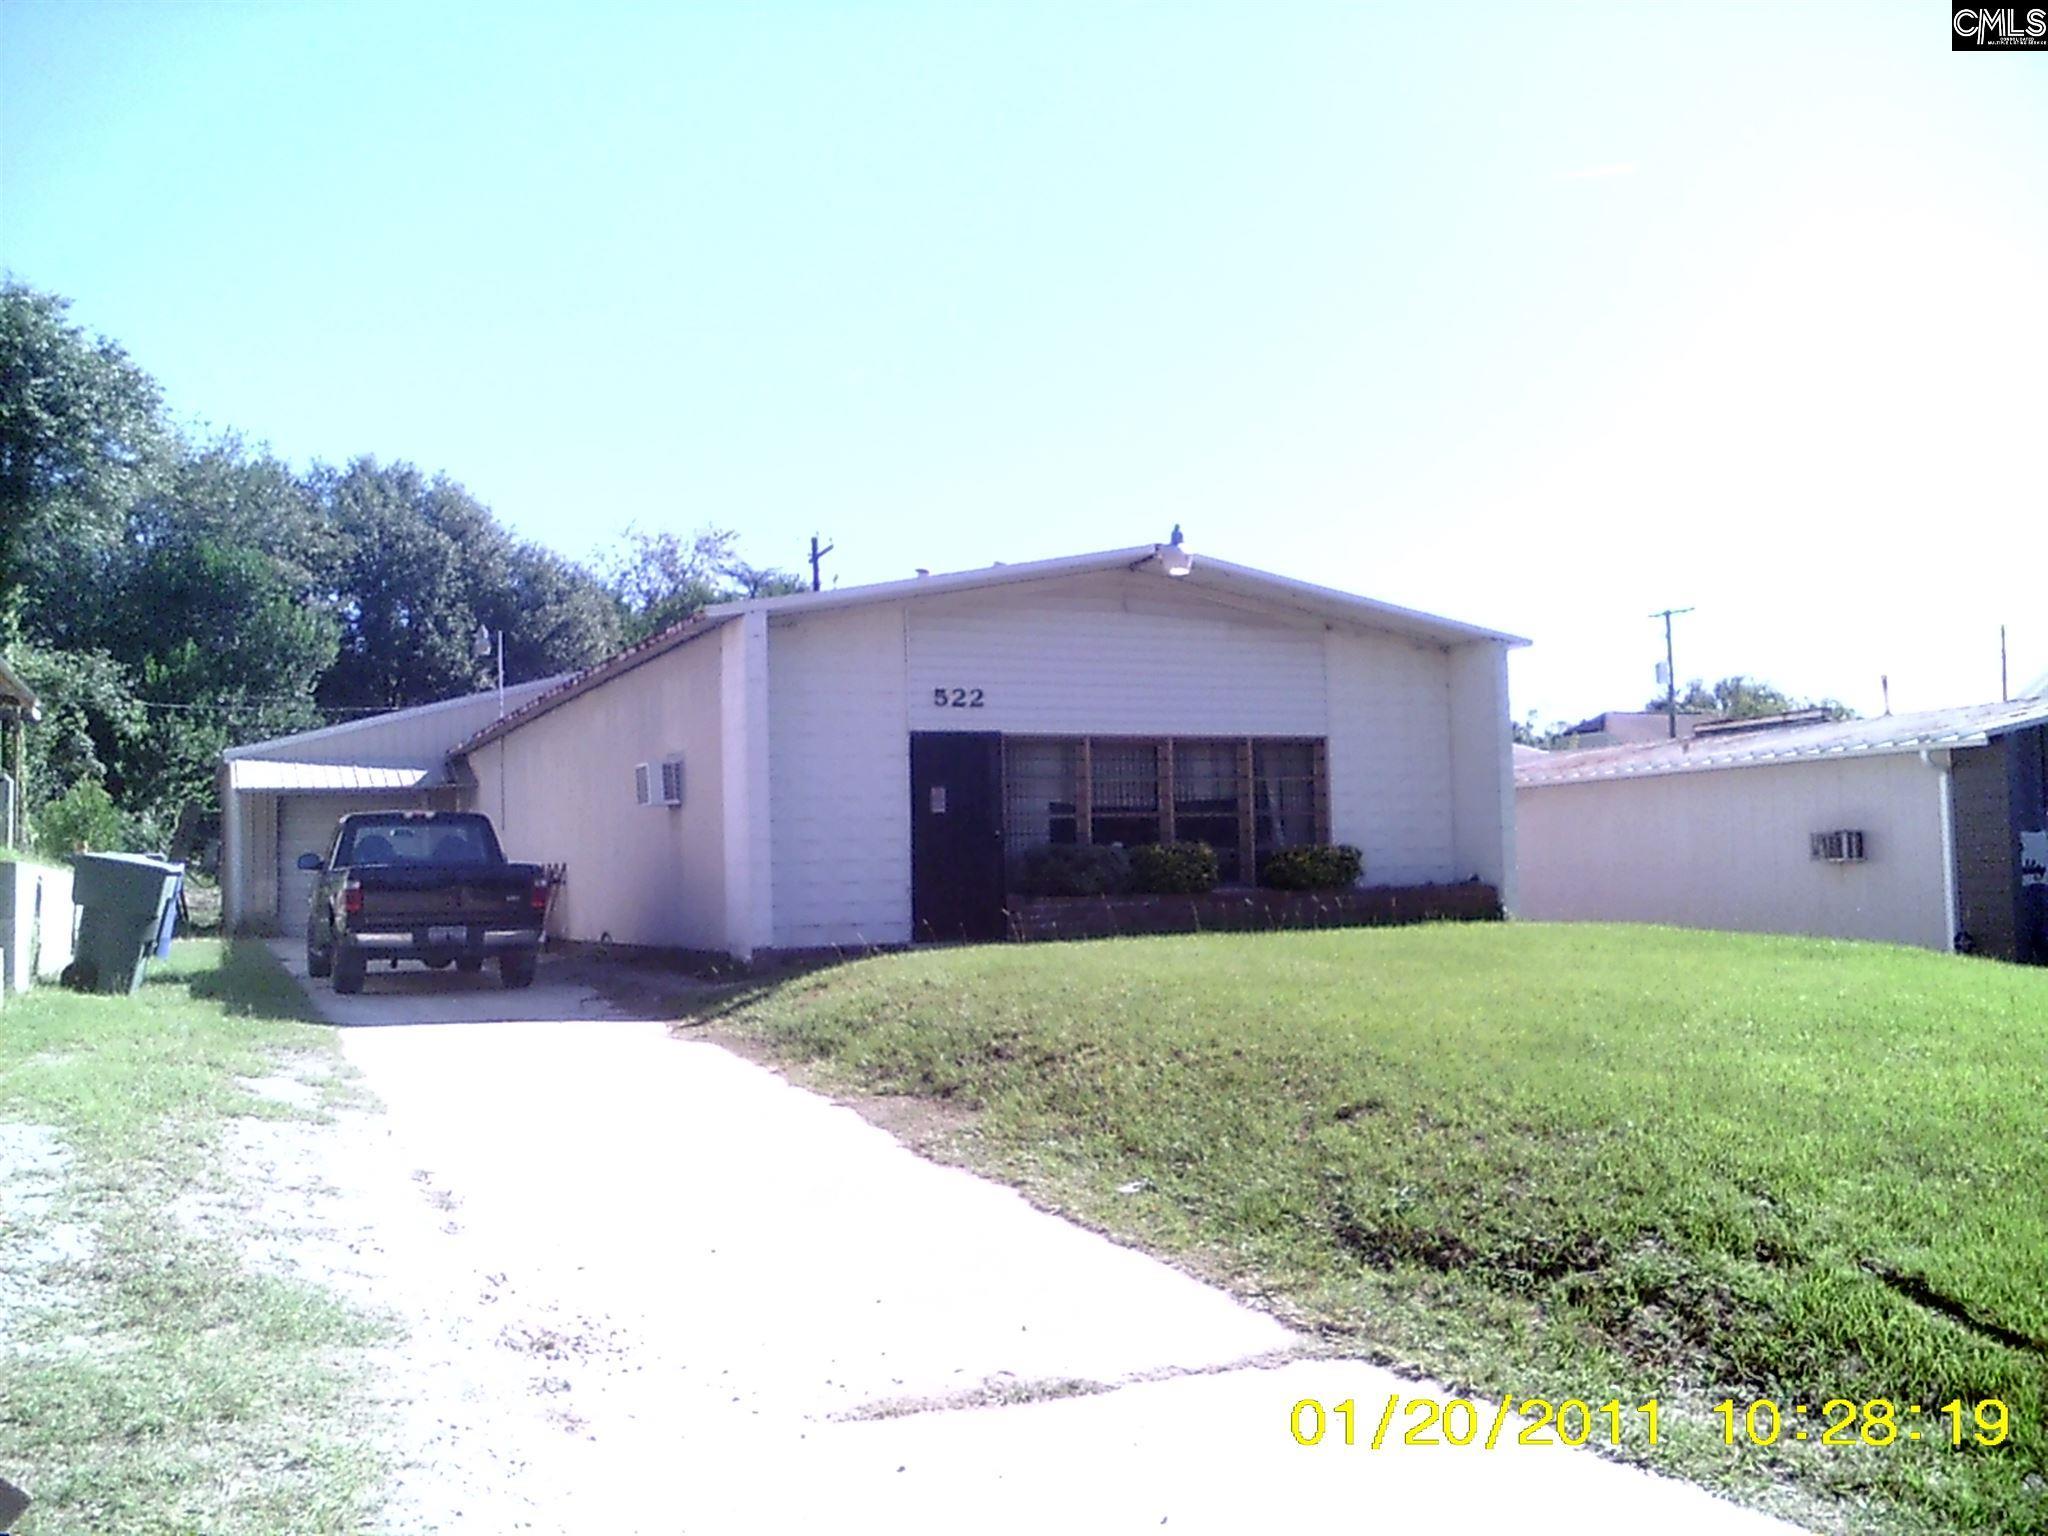 522 South Saluda Columbia, SC 29205